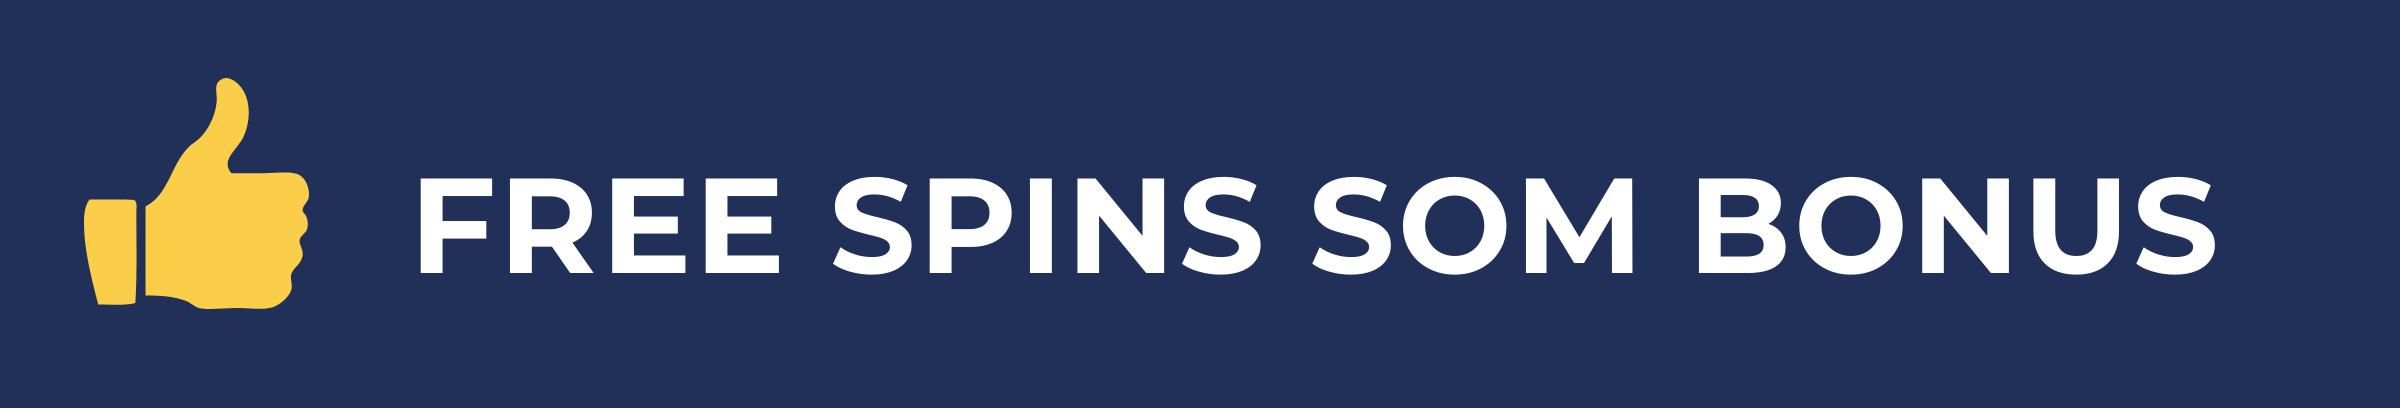 free spins som bonus svensknatcasino com